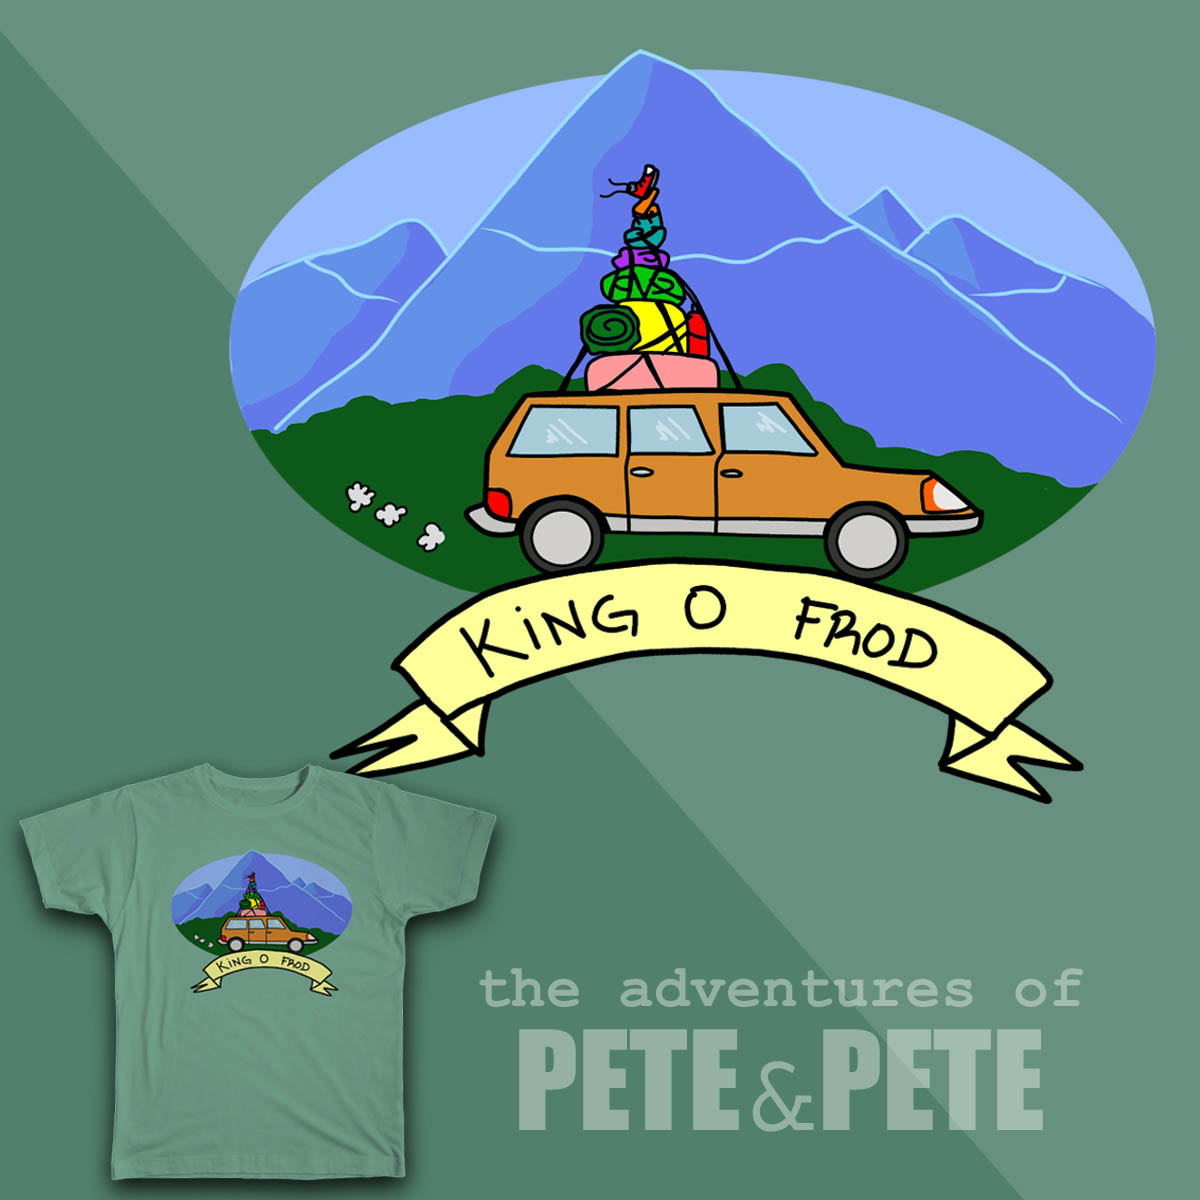 King O Frod